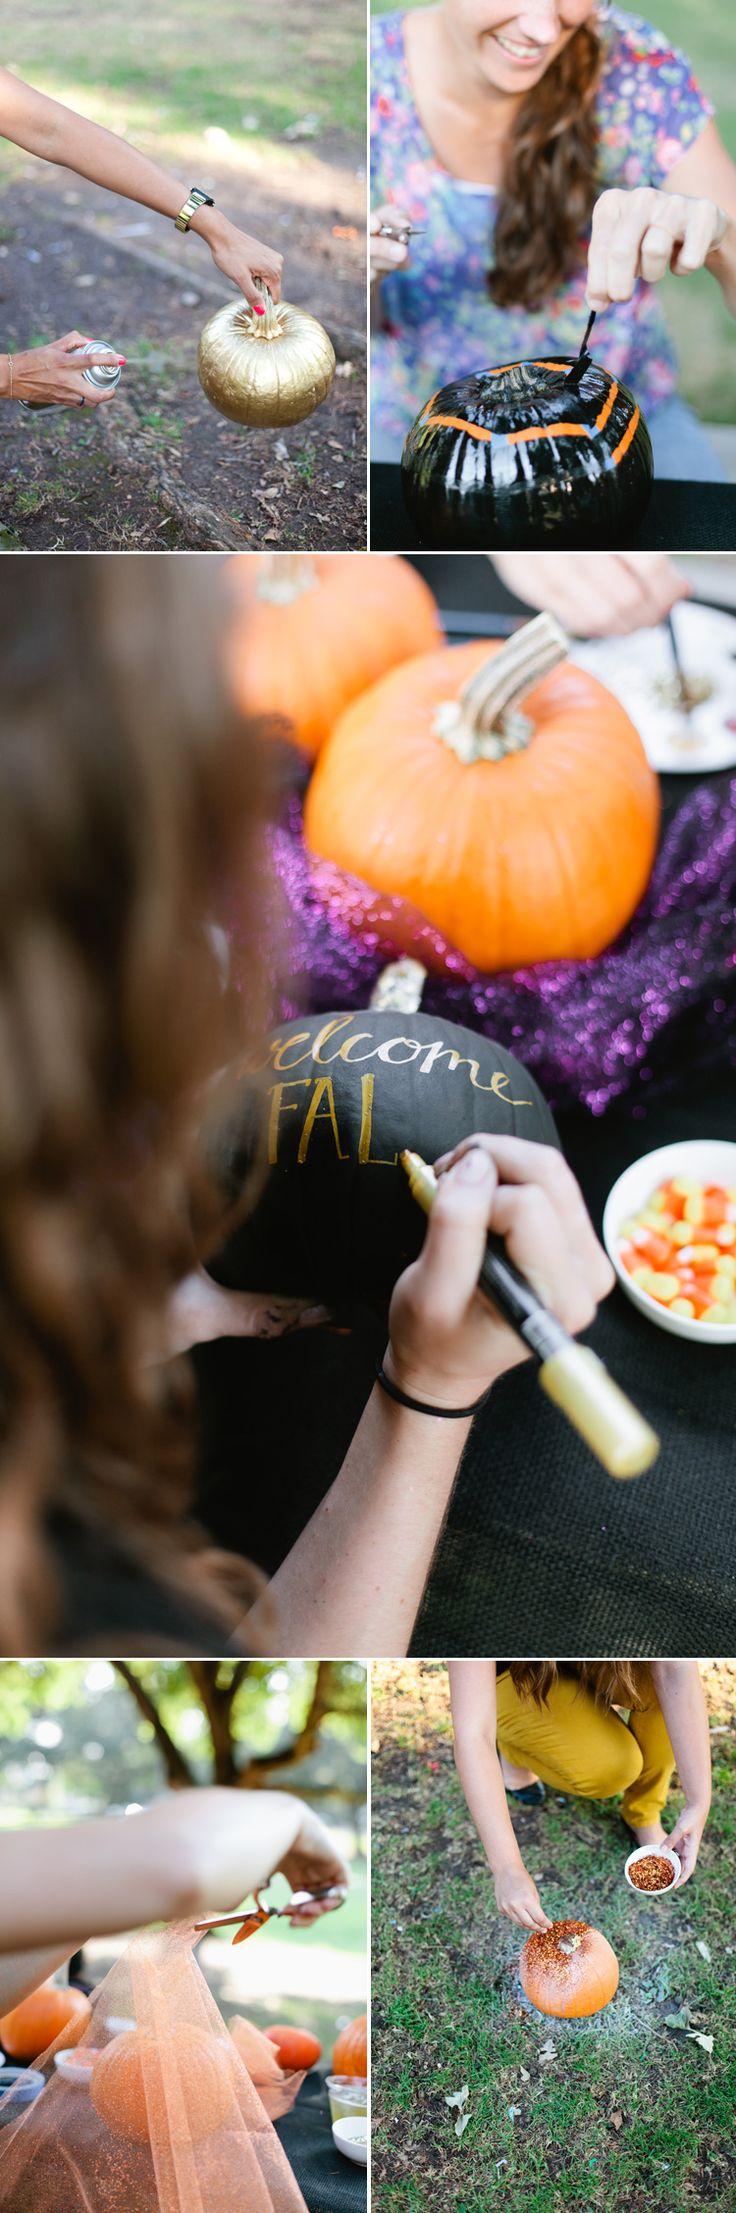 5 No-Carve Pumpkin Decorating Ideas @Carol Norris